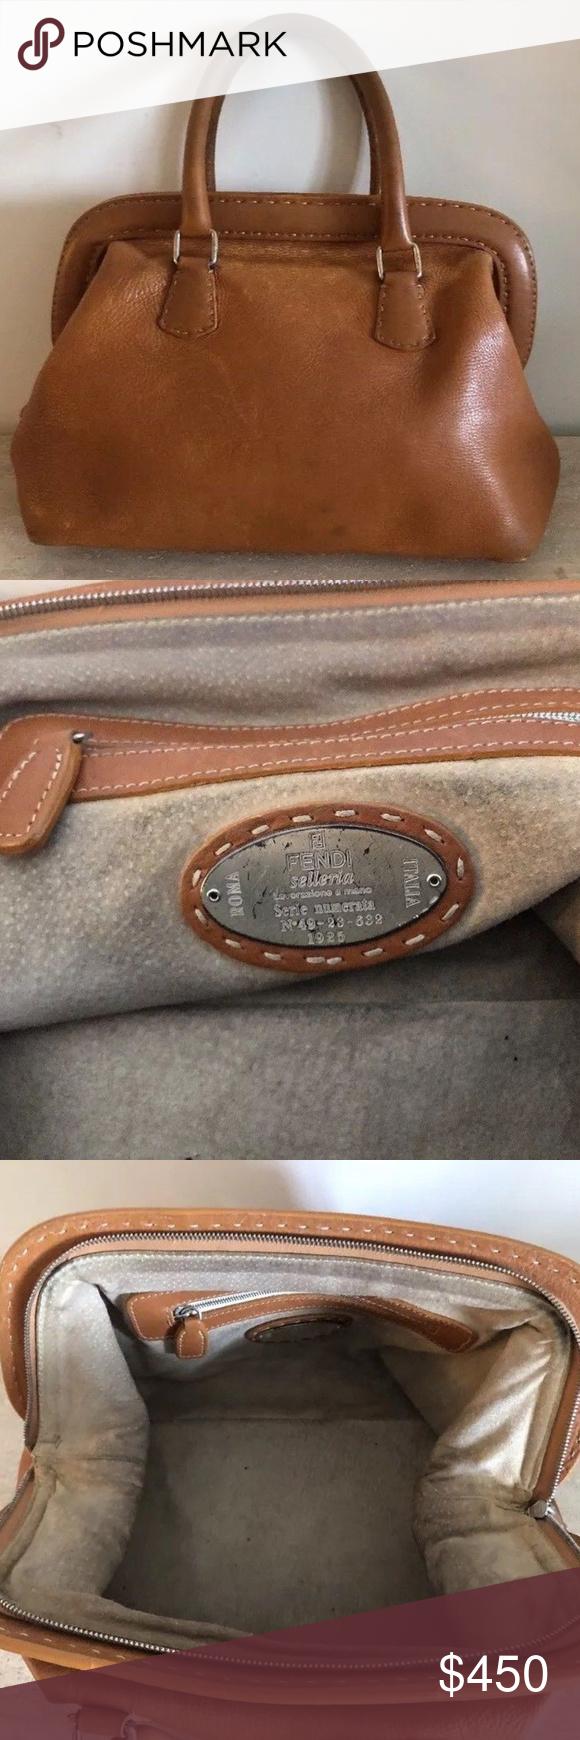 0f2febf3b7 Fendi Seleria Doctor bag congnac Leather handbag • FABULOUS FENDI LARGE  SIZED DOCTOR BAG. GUARANTEED